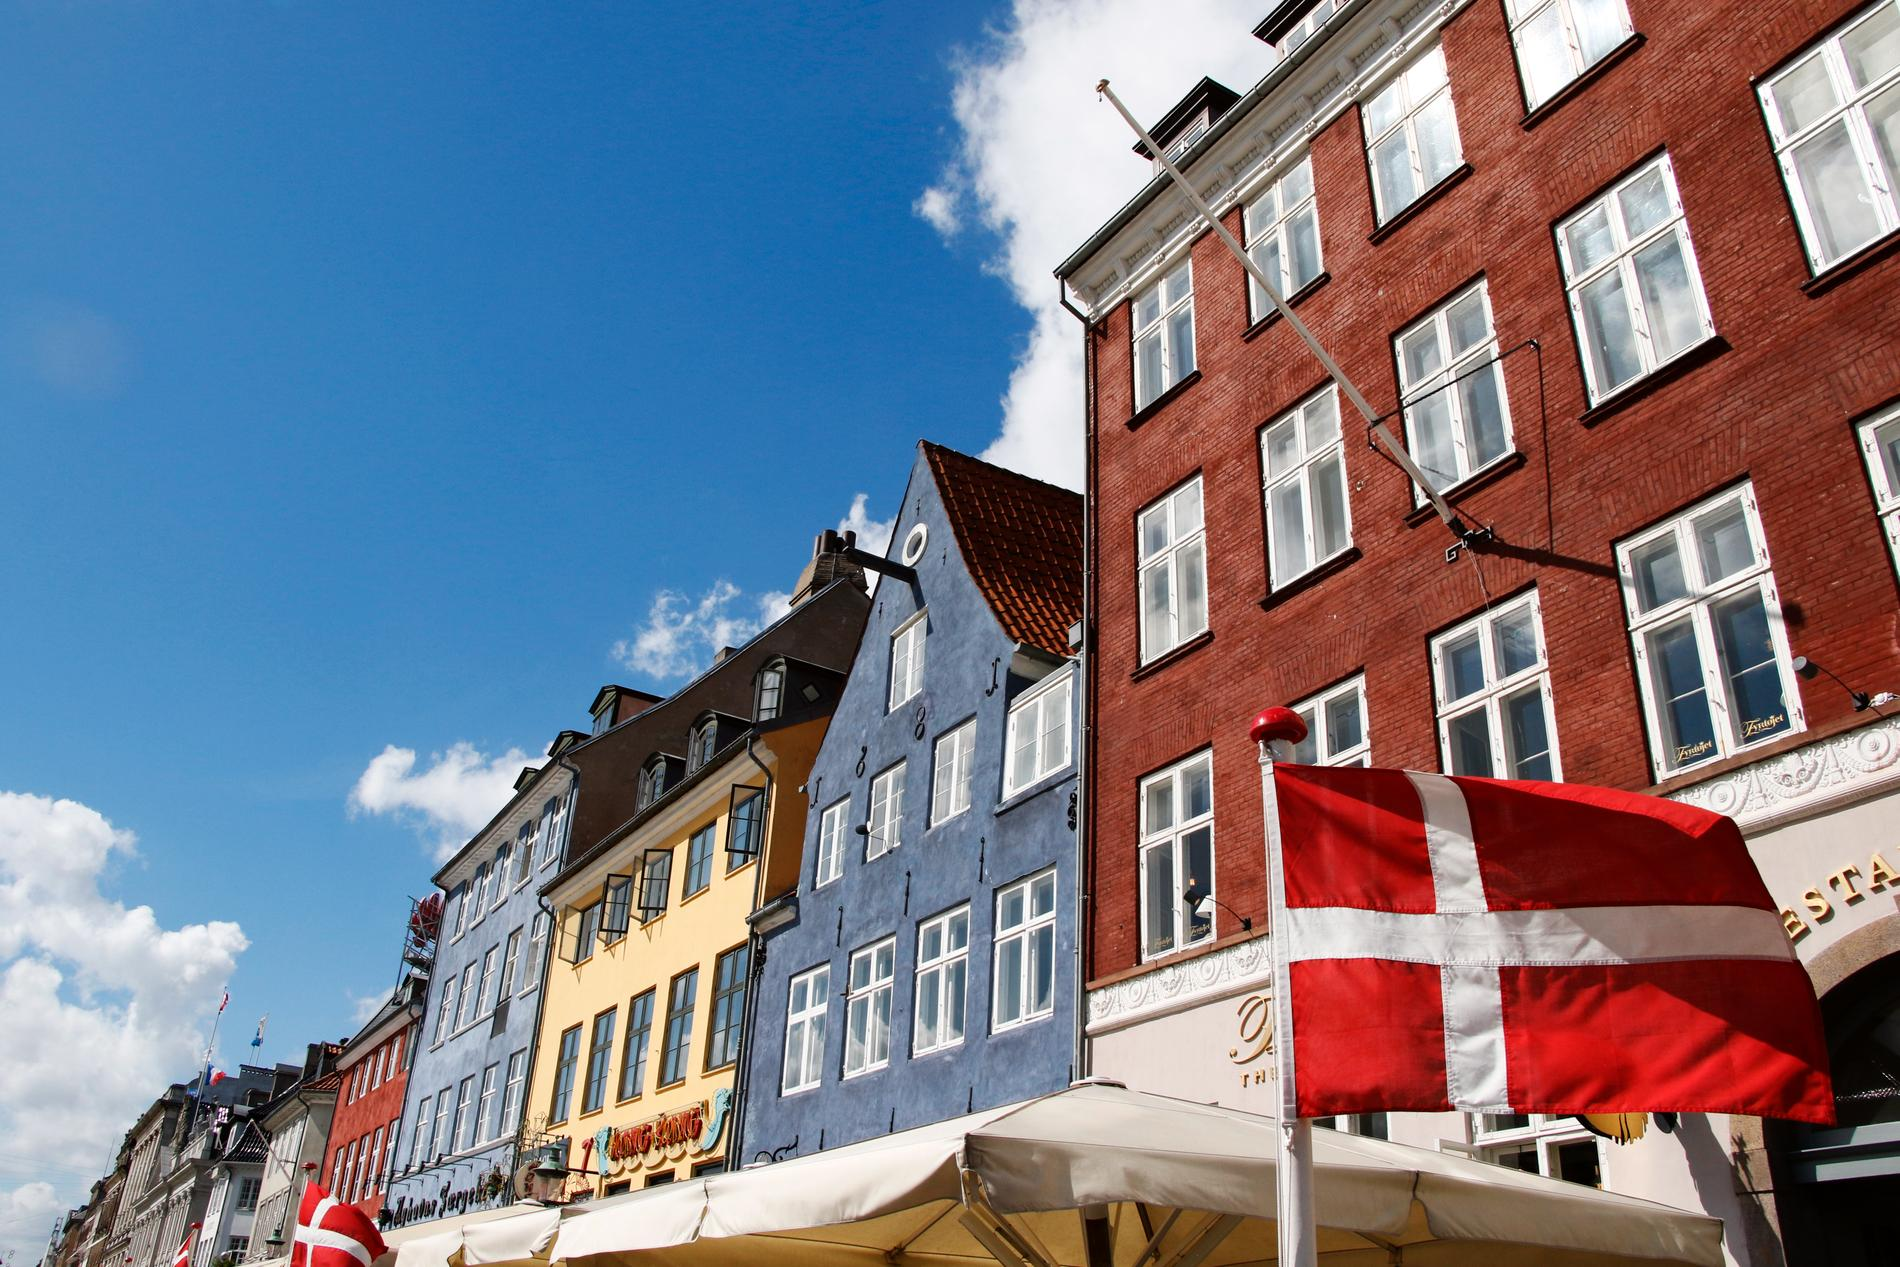 I Danmark kan ett positivt antikroppstest vara biljetten in i landet.